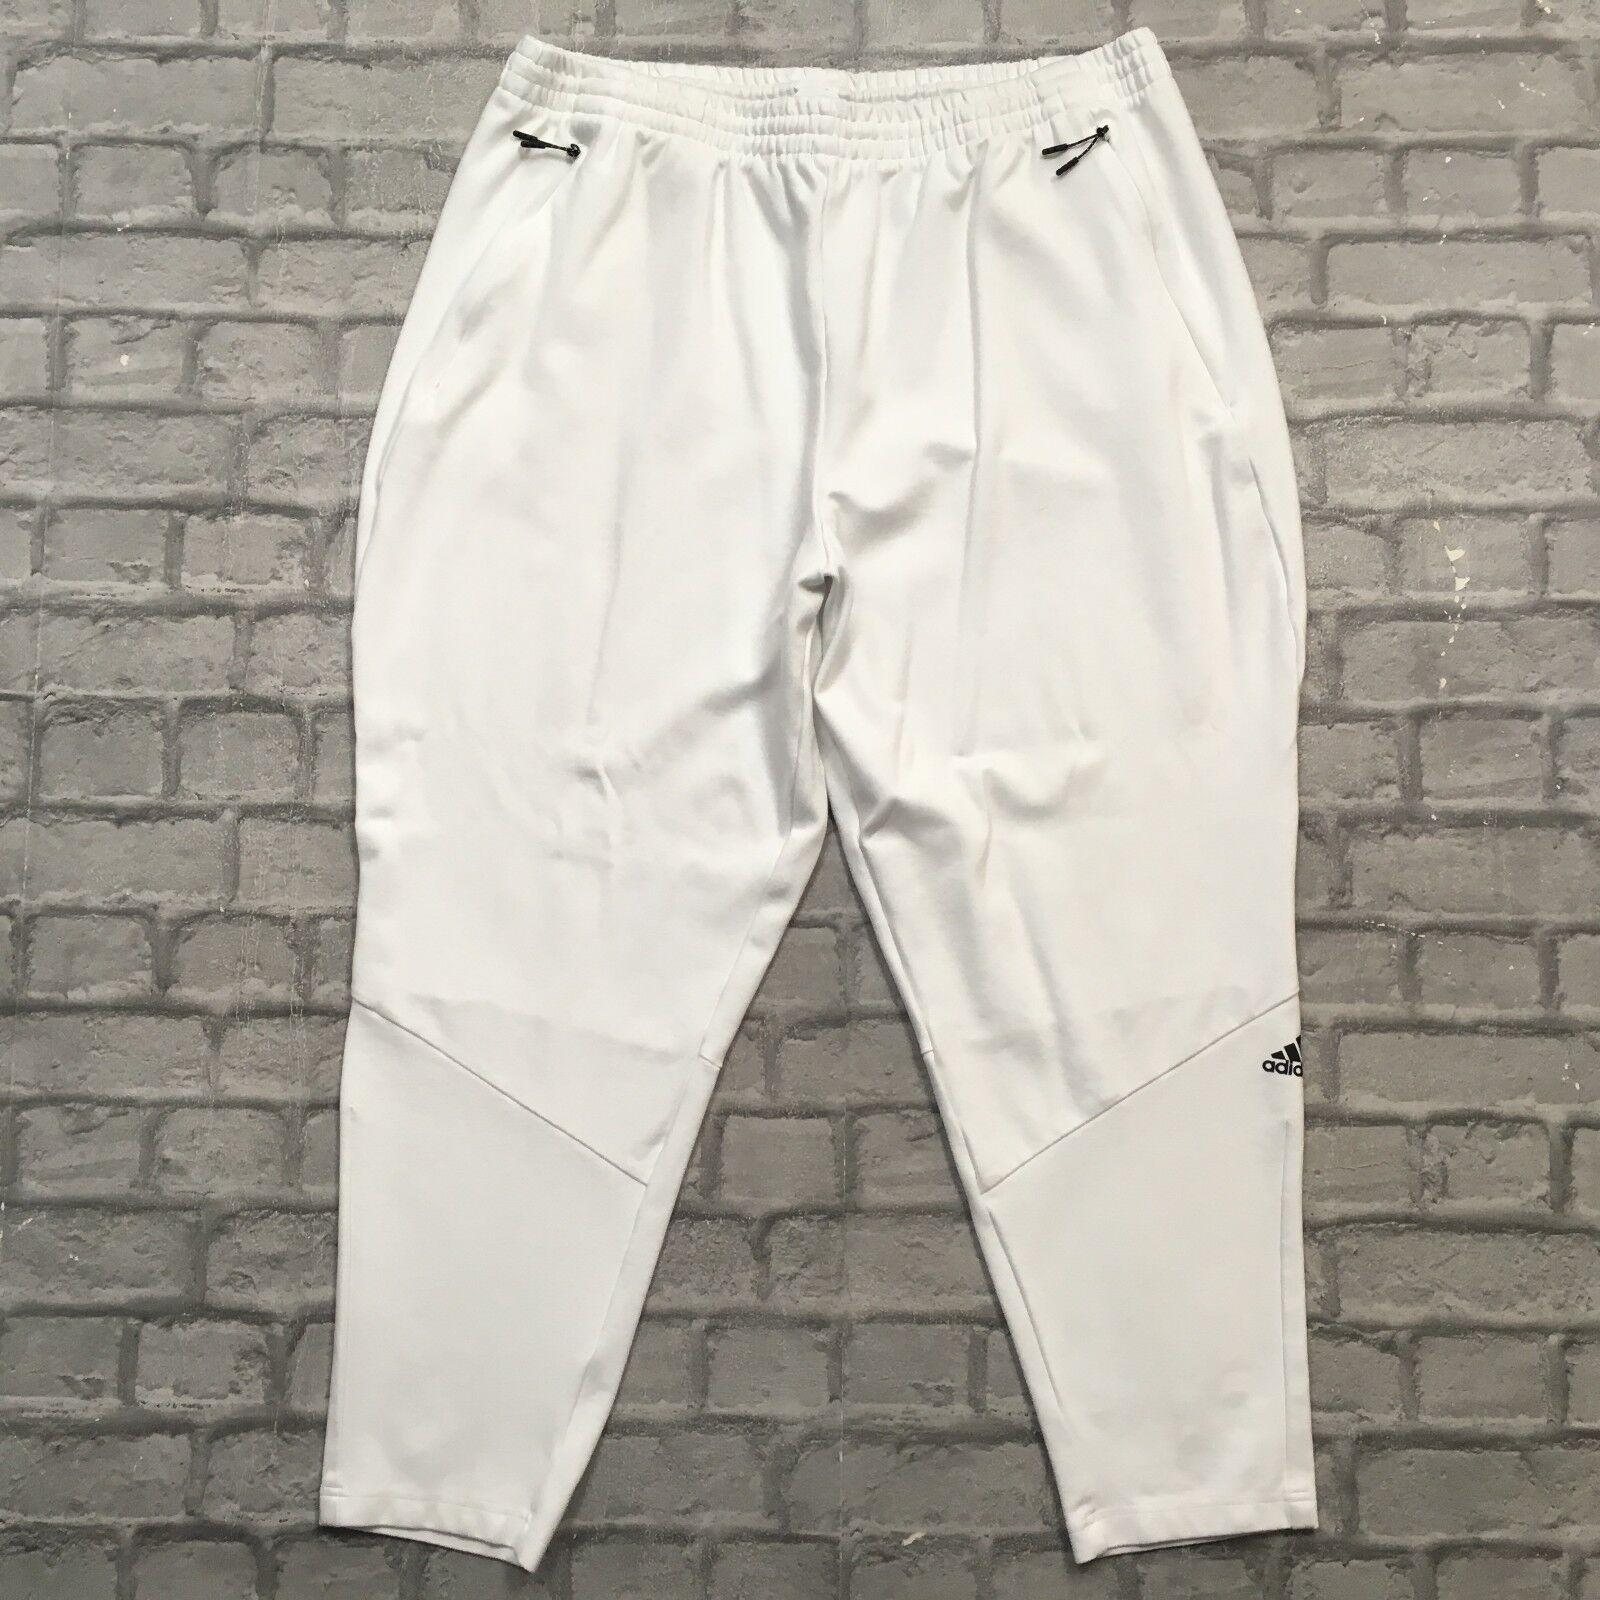 Jogging Performance Zne De 2xl Uk Homme Adidas Pantalon Blanc 8OUUf